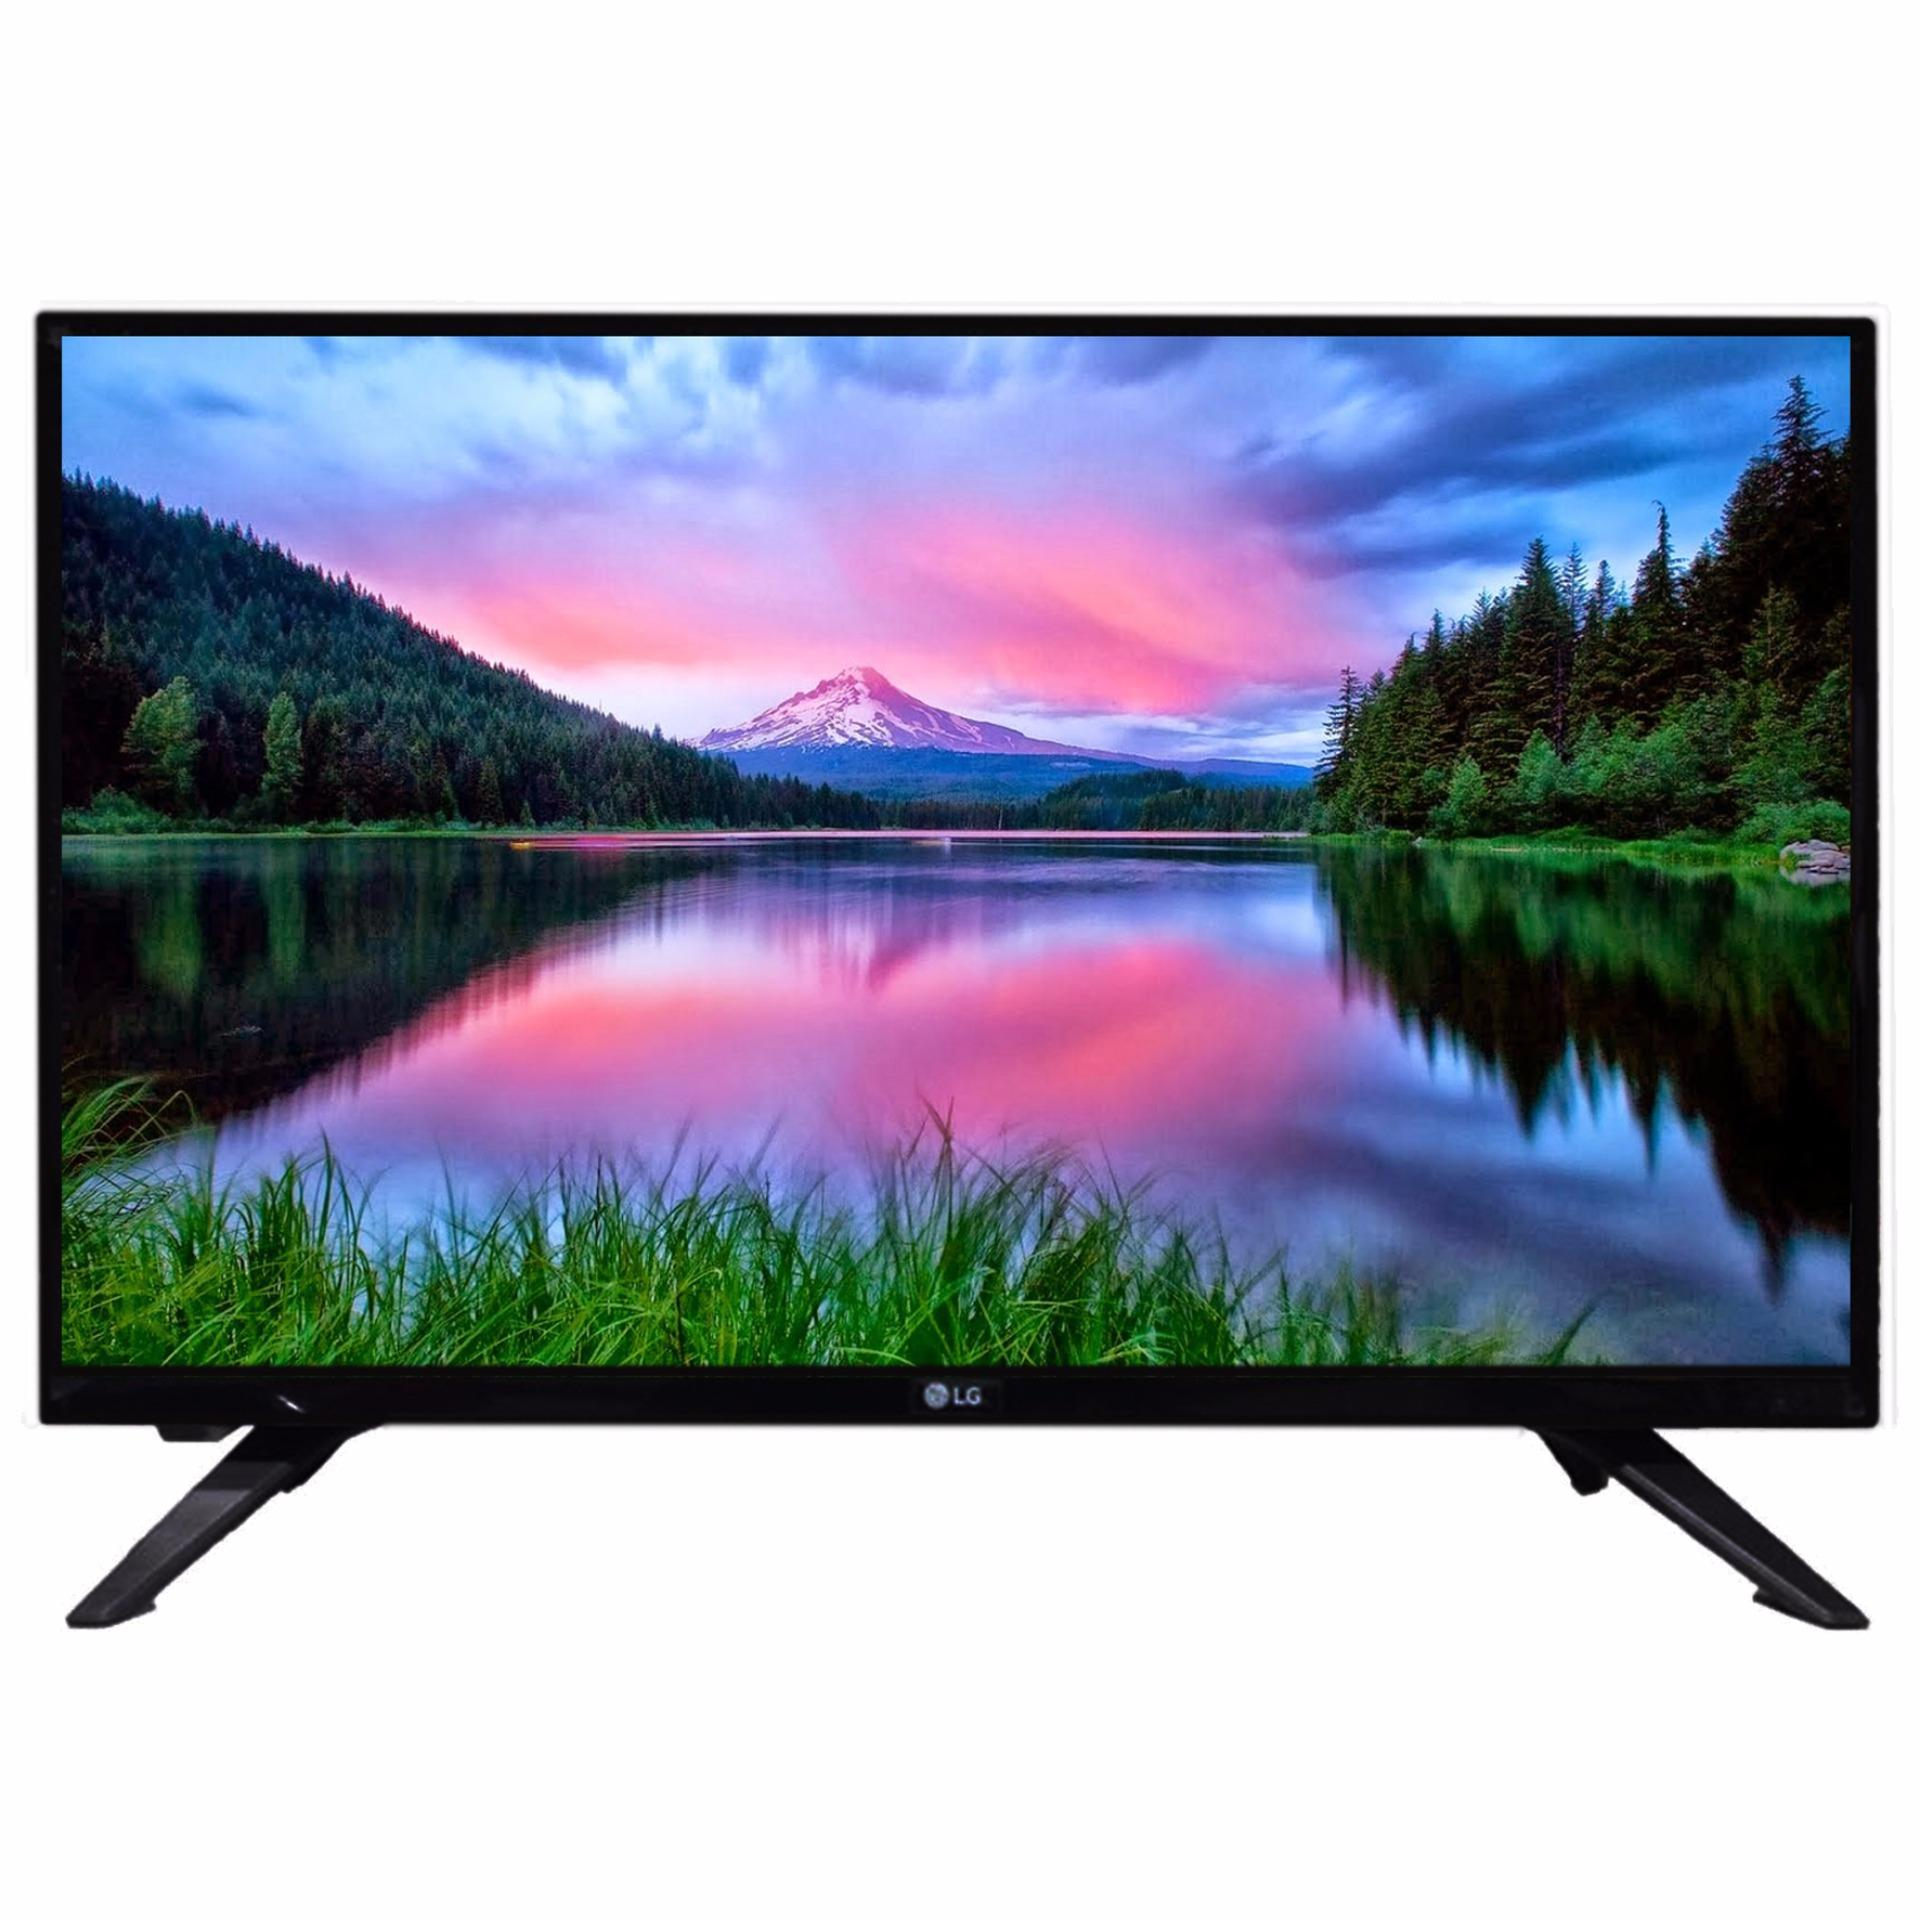 Lg Led Tv 32 32lj500d Free Breket Hitam Khusus Jadetabek Cek Harga Samsung 32fh4003r Inch Jabodetabek Monitor Hd Ready 28